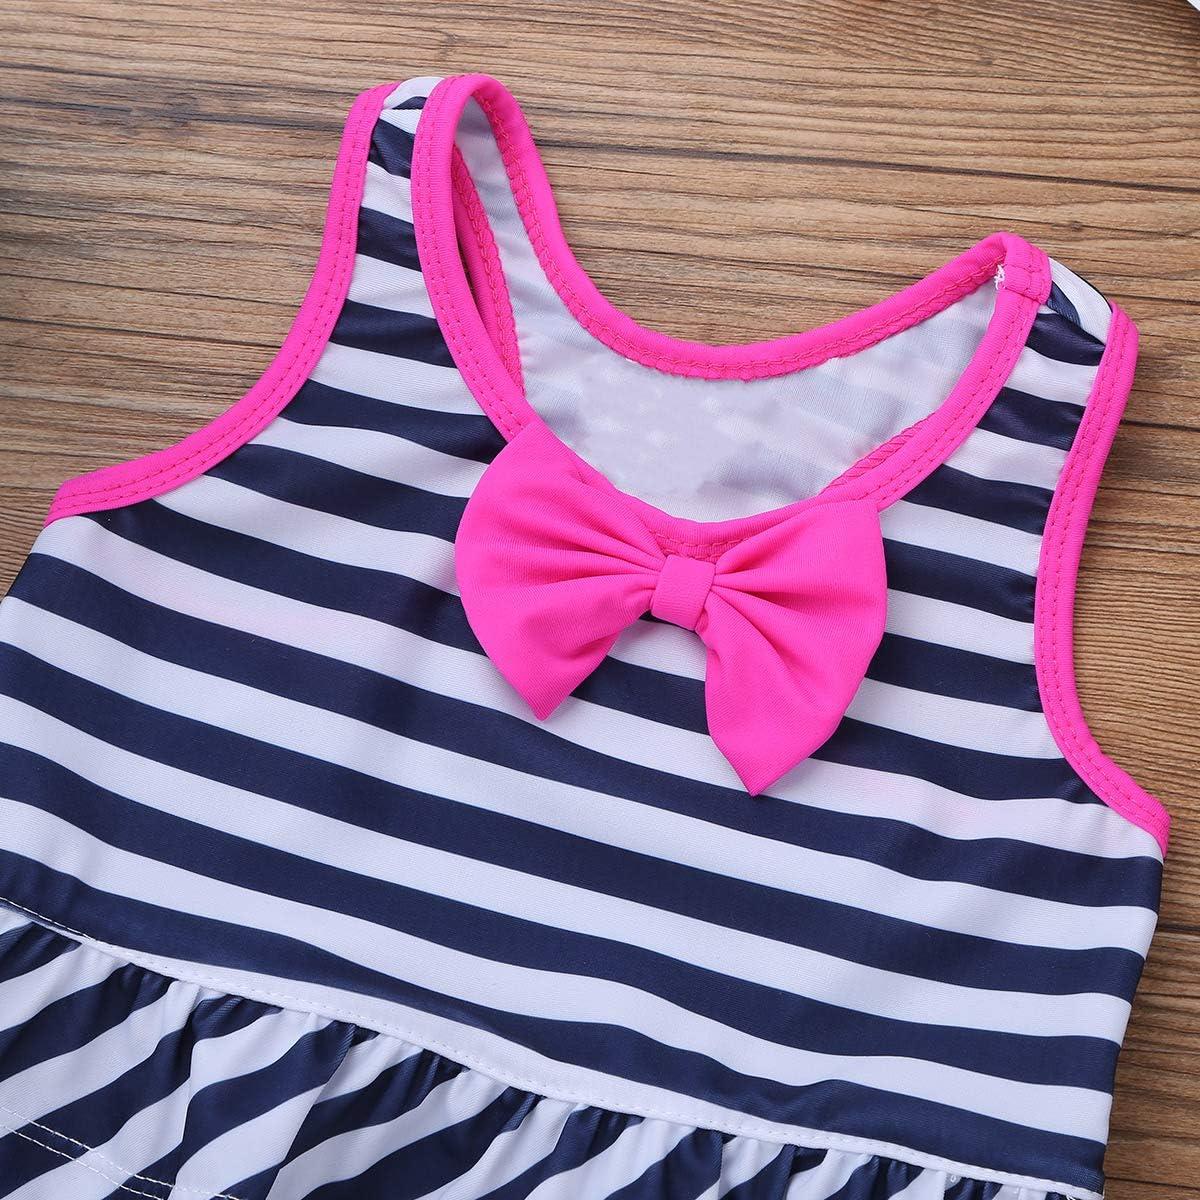 iiniim Baby M/ädchen Tankini Bikini Einteiler Badeanzug Polka Dots Schwimmanzug Bademode